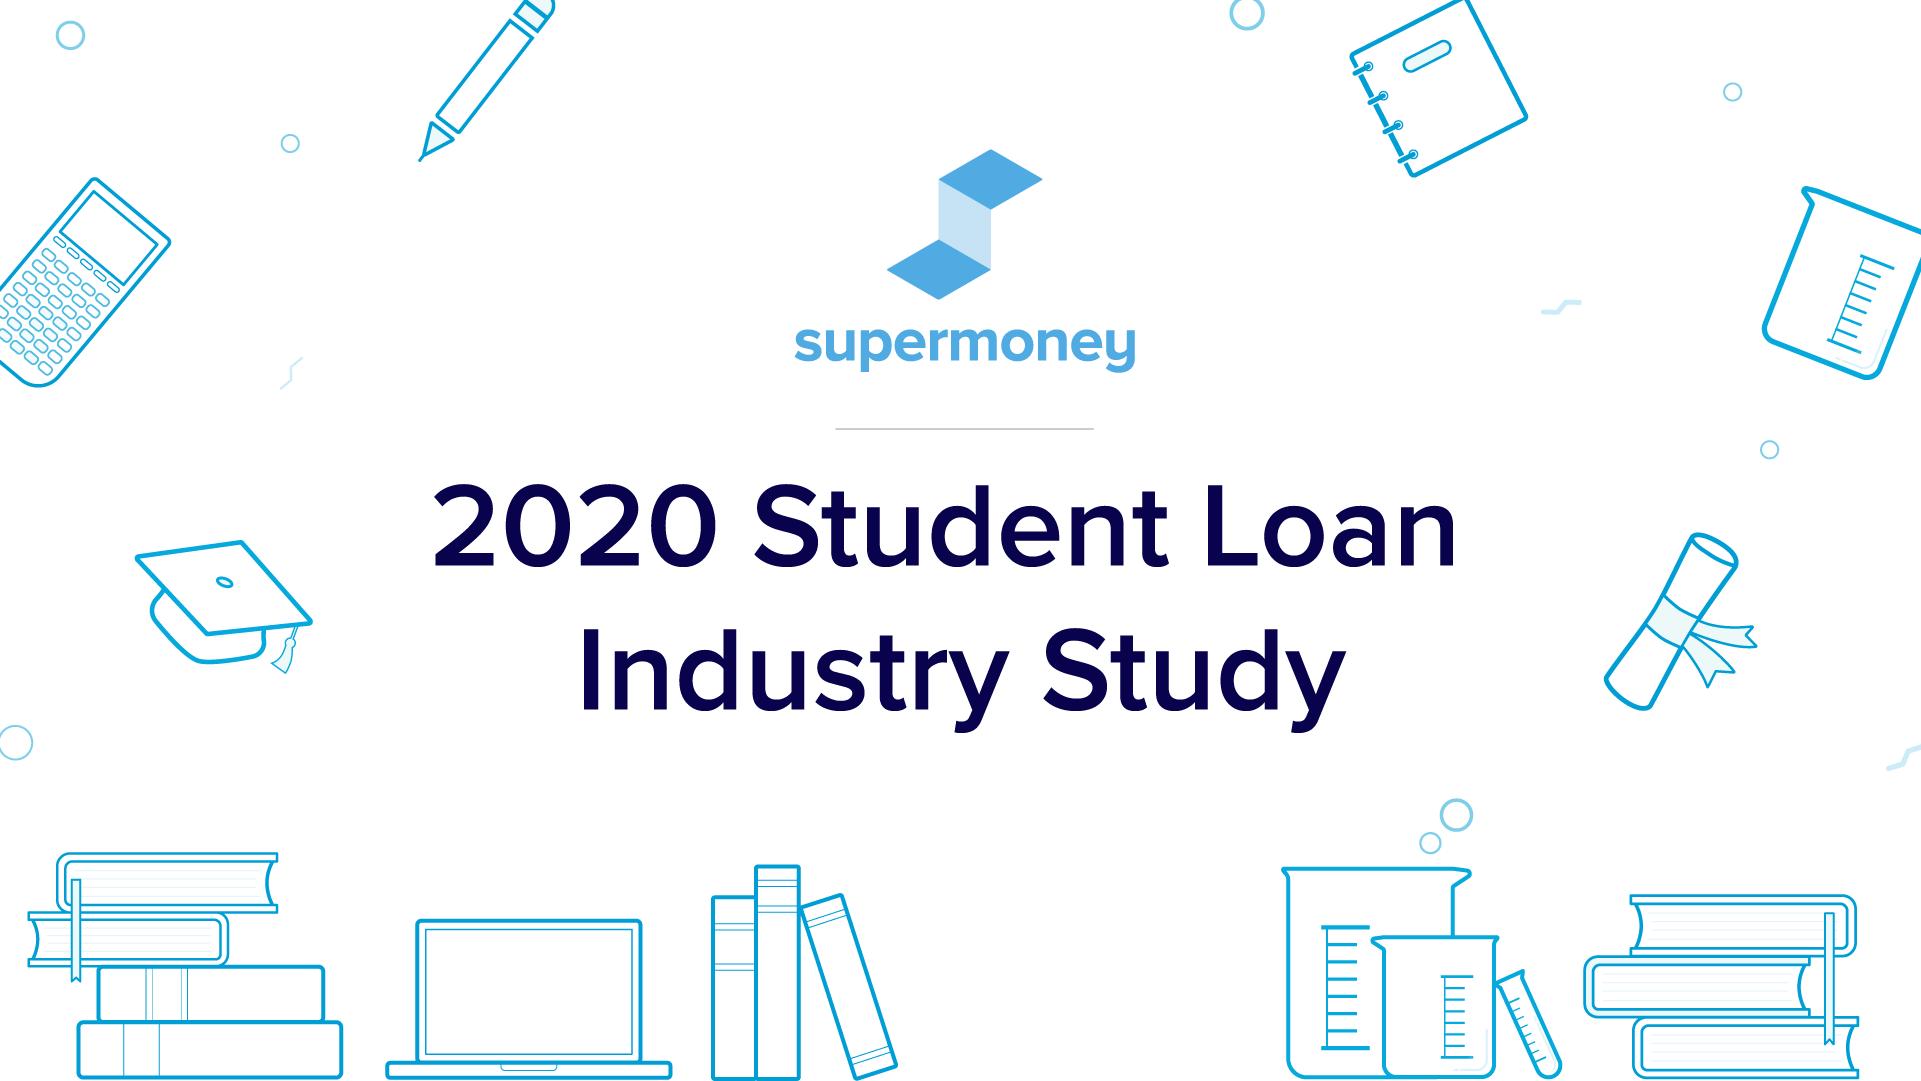 SuperMoney student loan